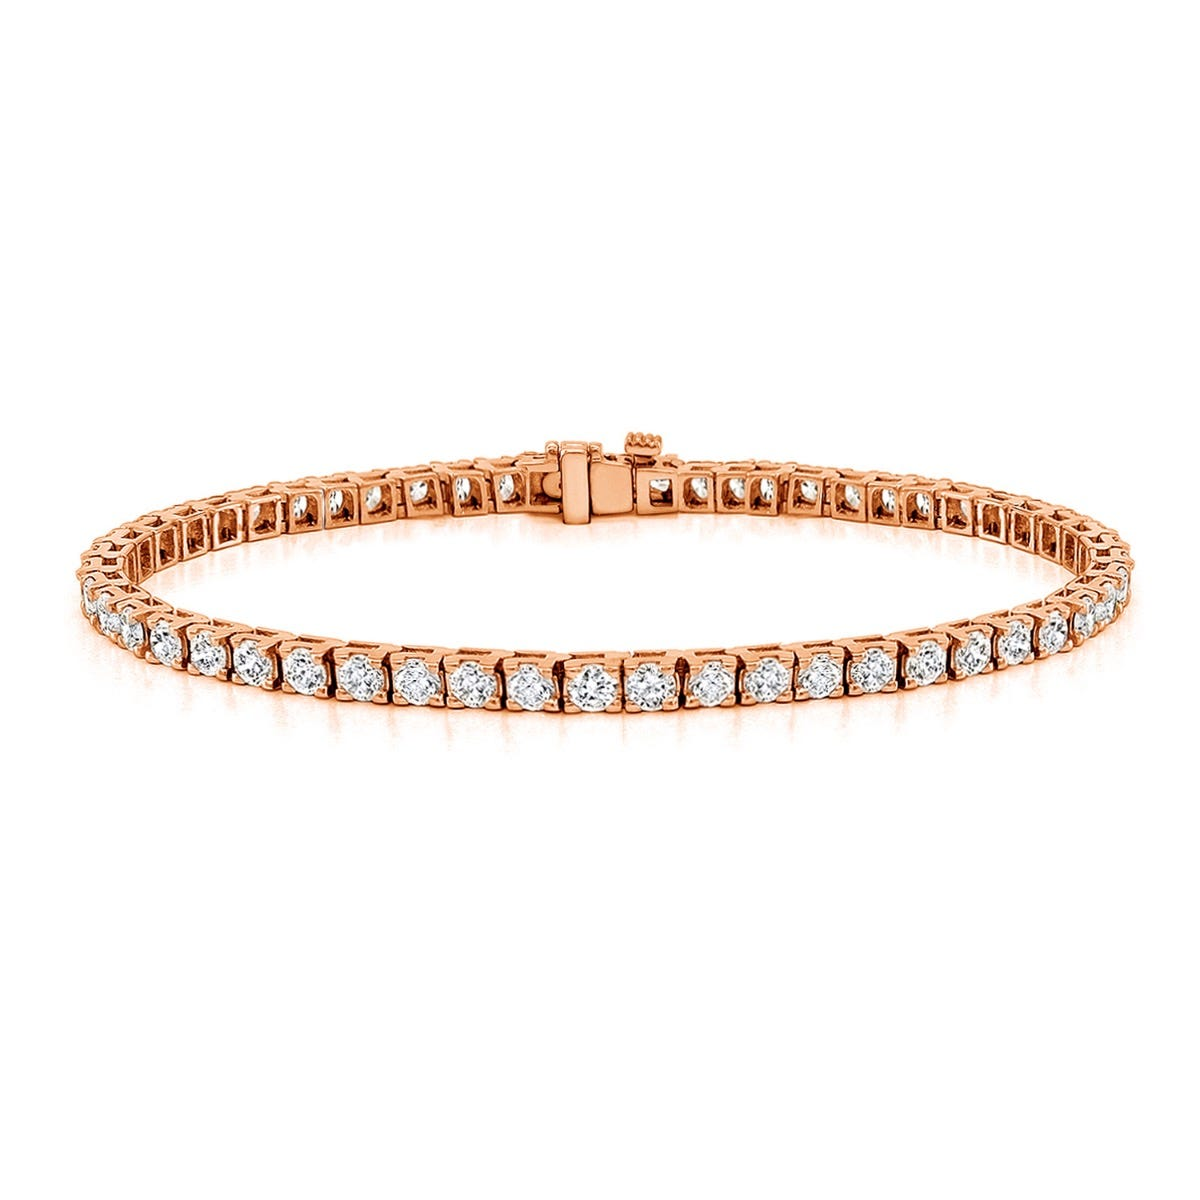 4ctw. 4-Prong Square Link Diamond Tennis Bracelet in 14K Rose Gold (IJ, I2-I3)